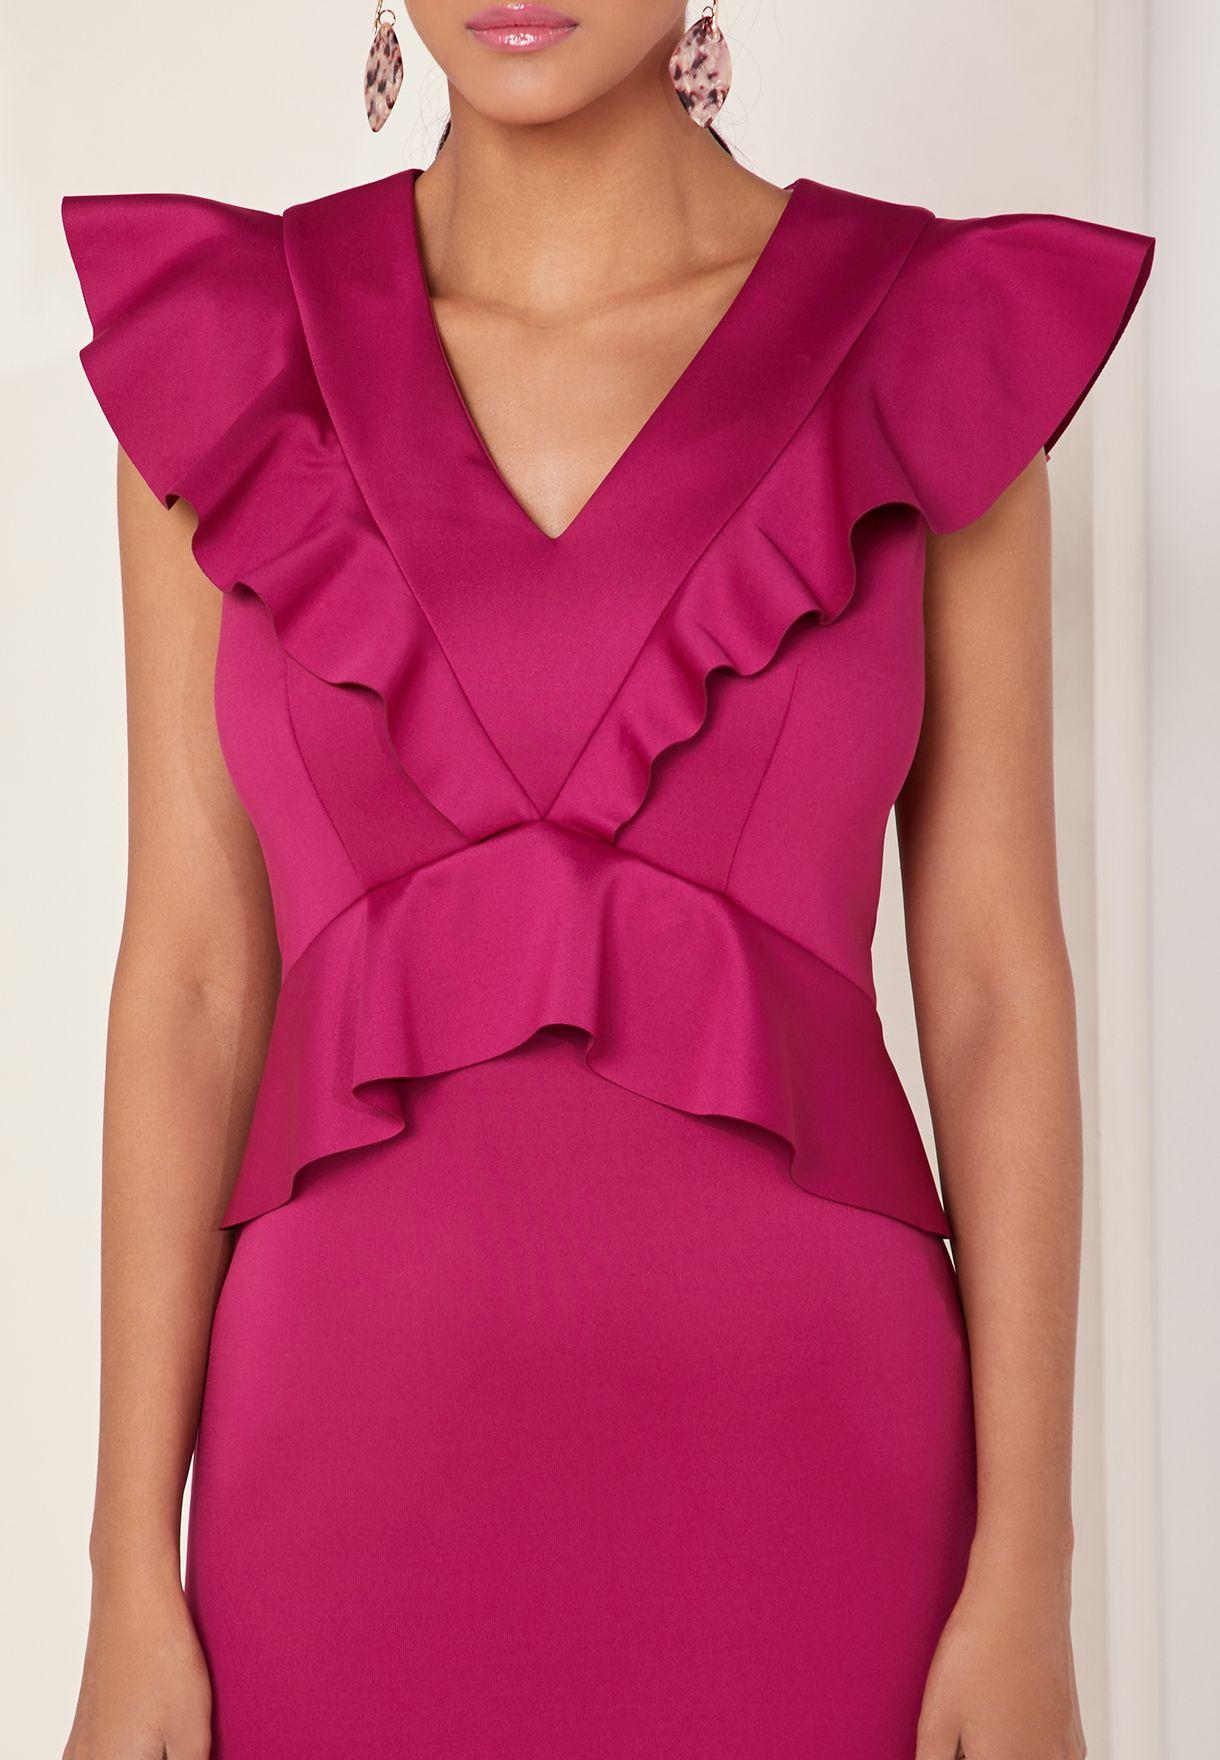 Ruffle Detail Bodycon Dress